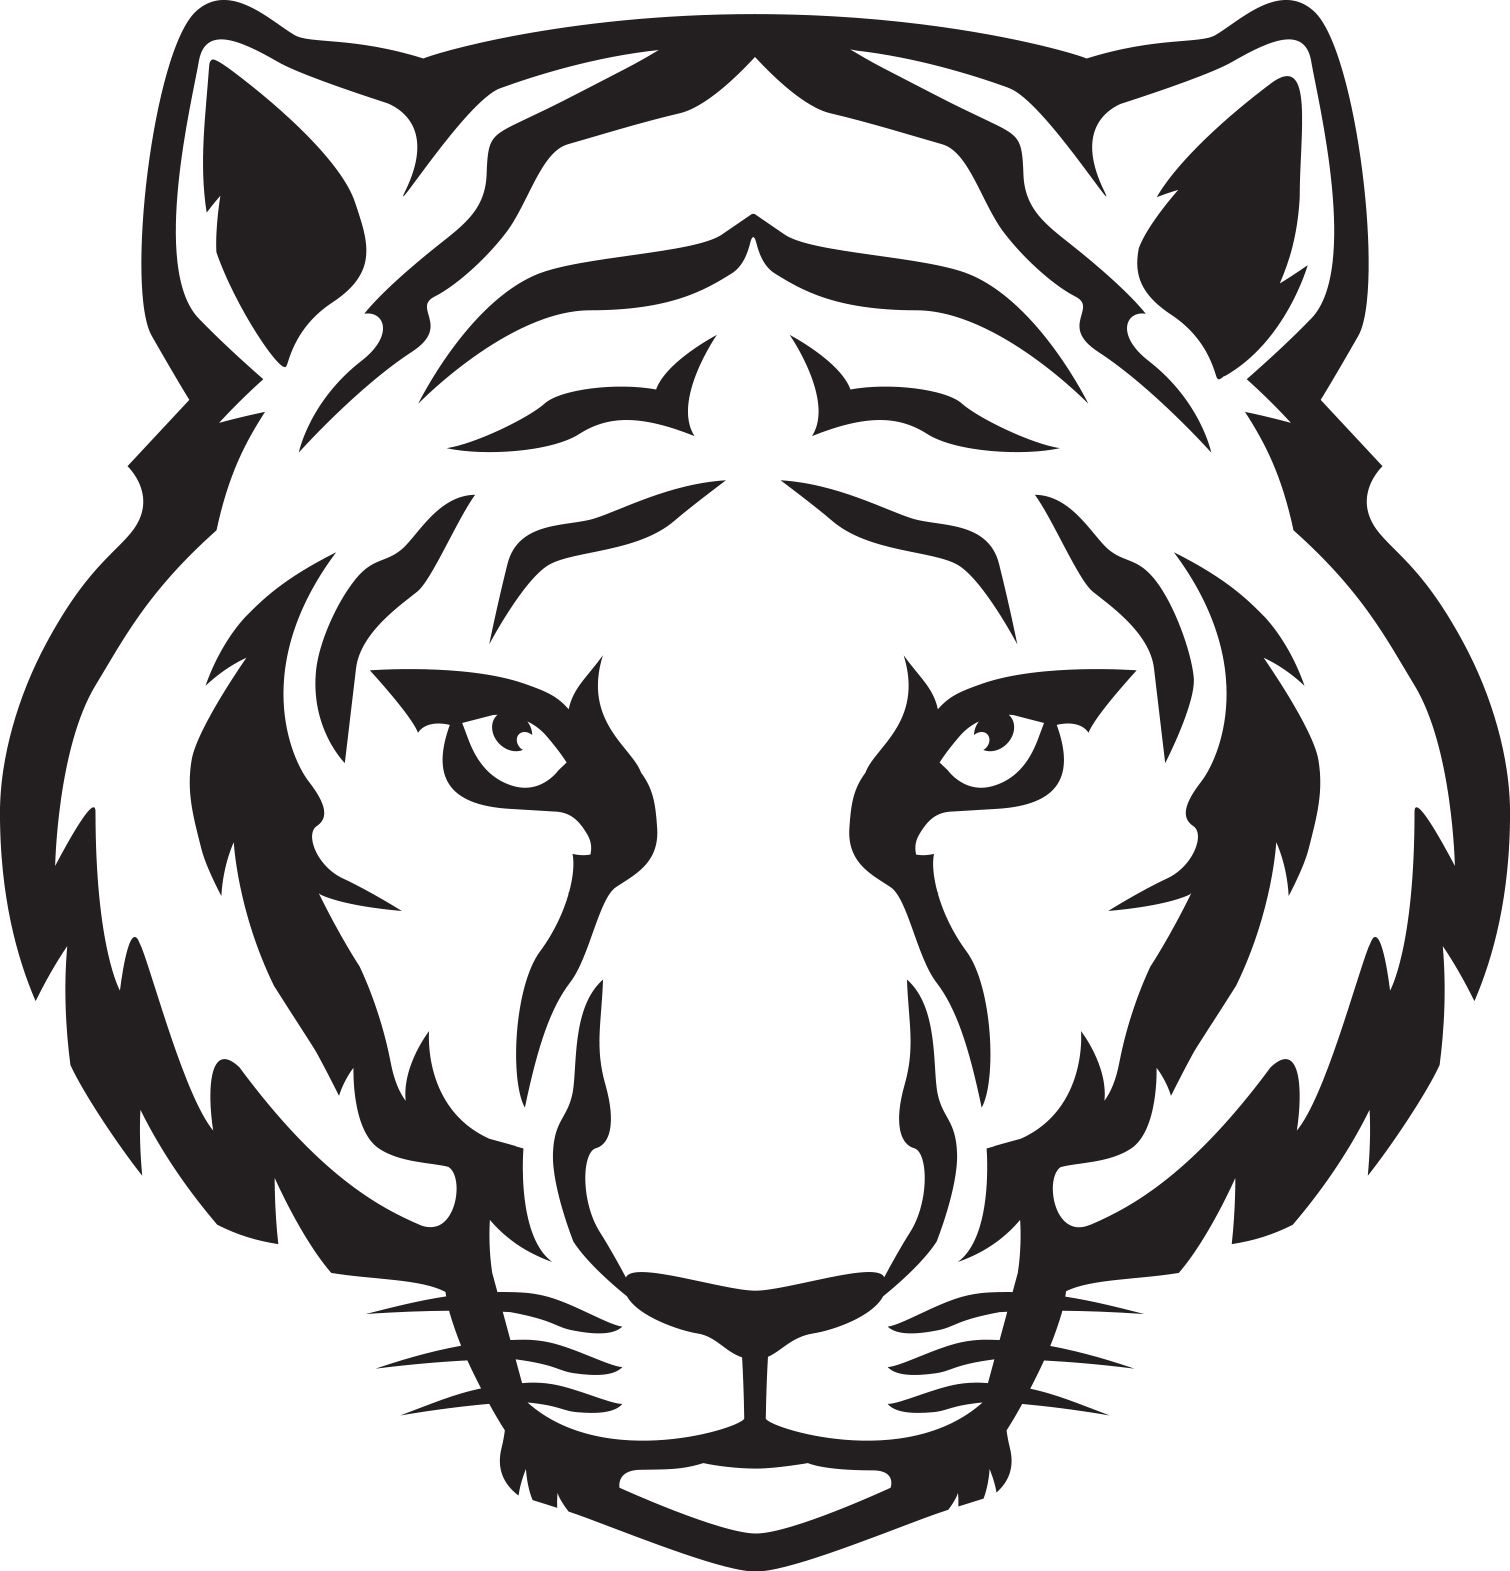 Tiger Head Clip Art  Tiger face drawing, Tiger images, Tiger face